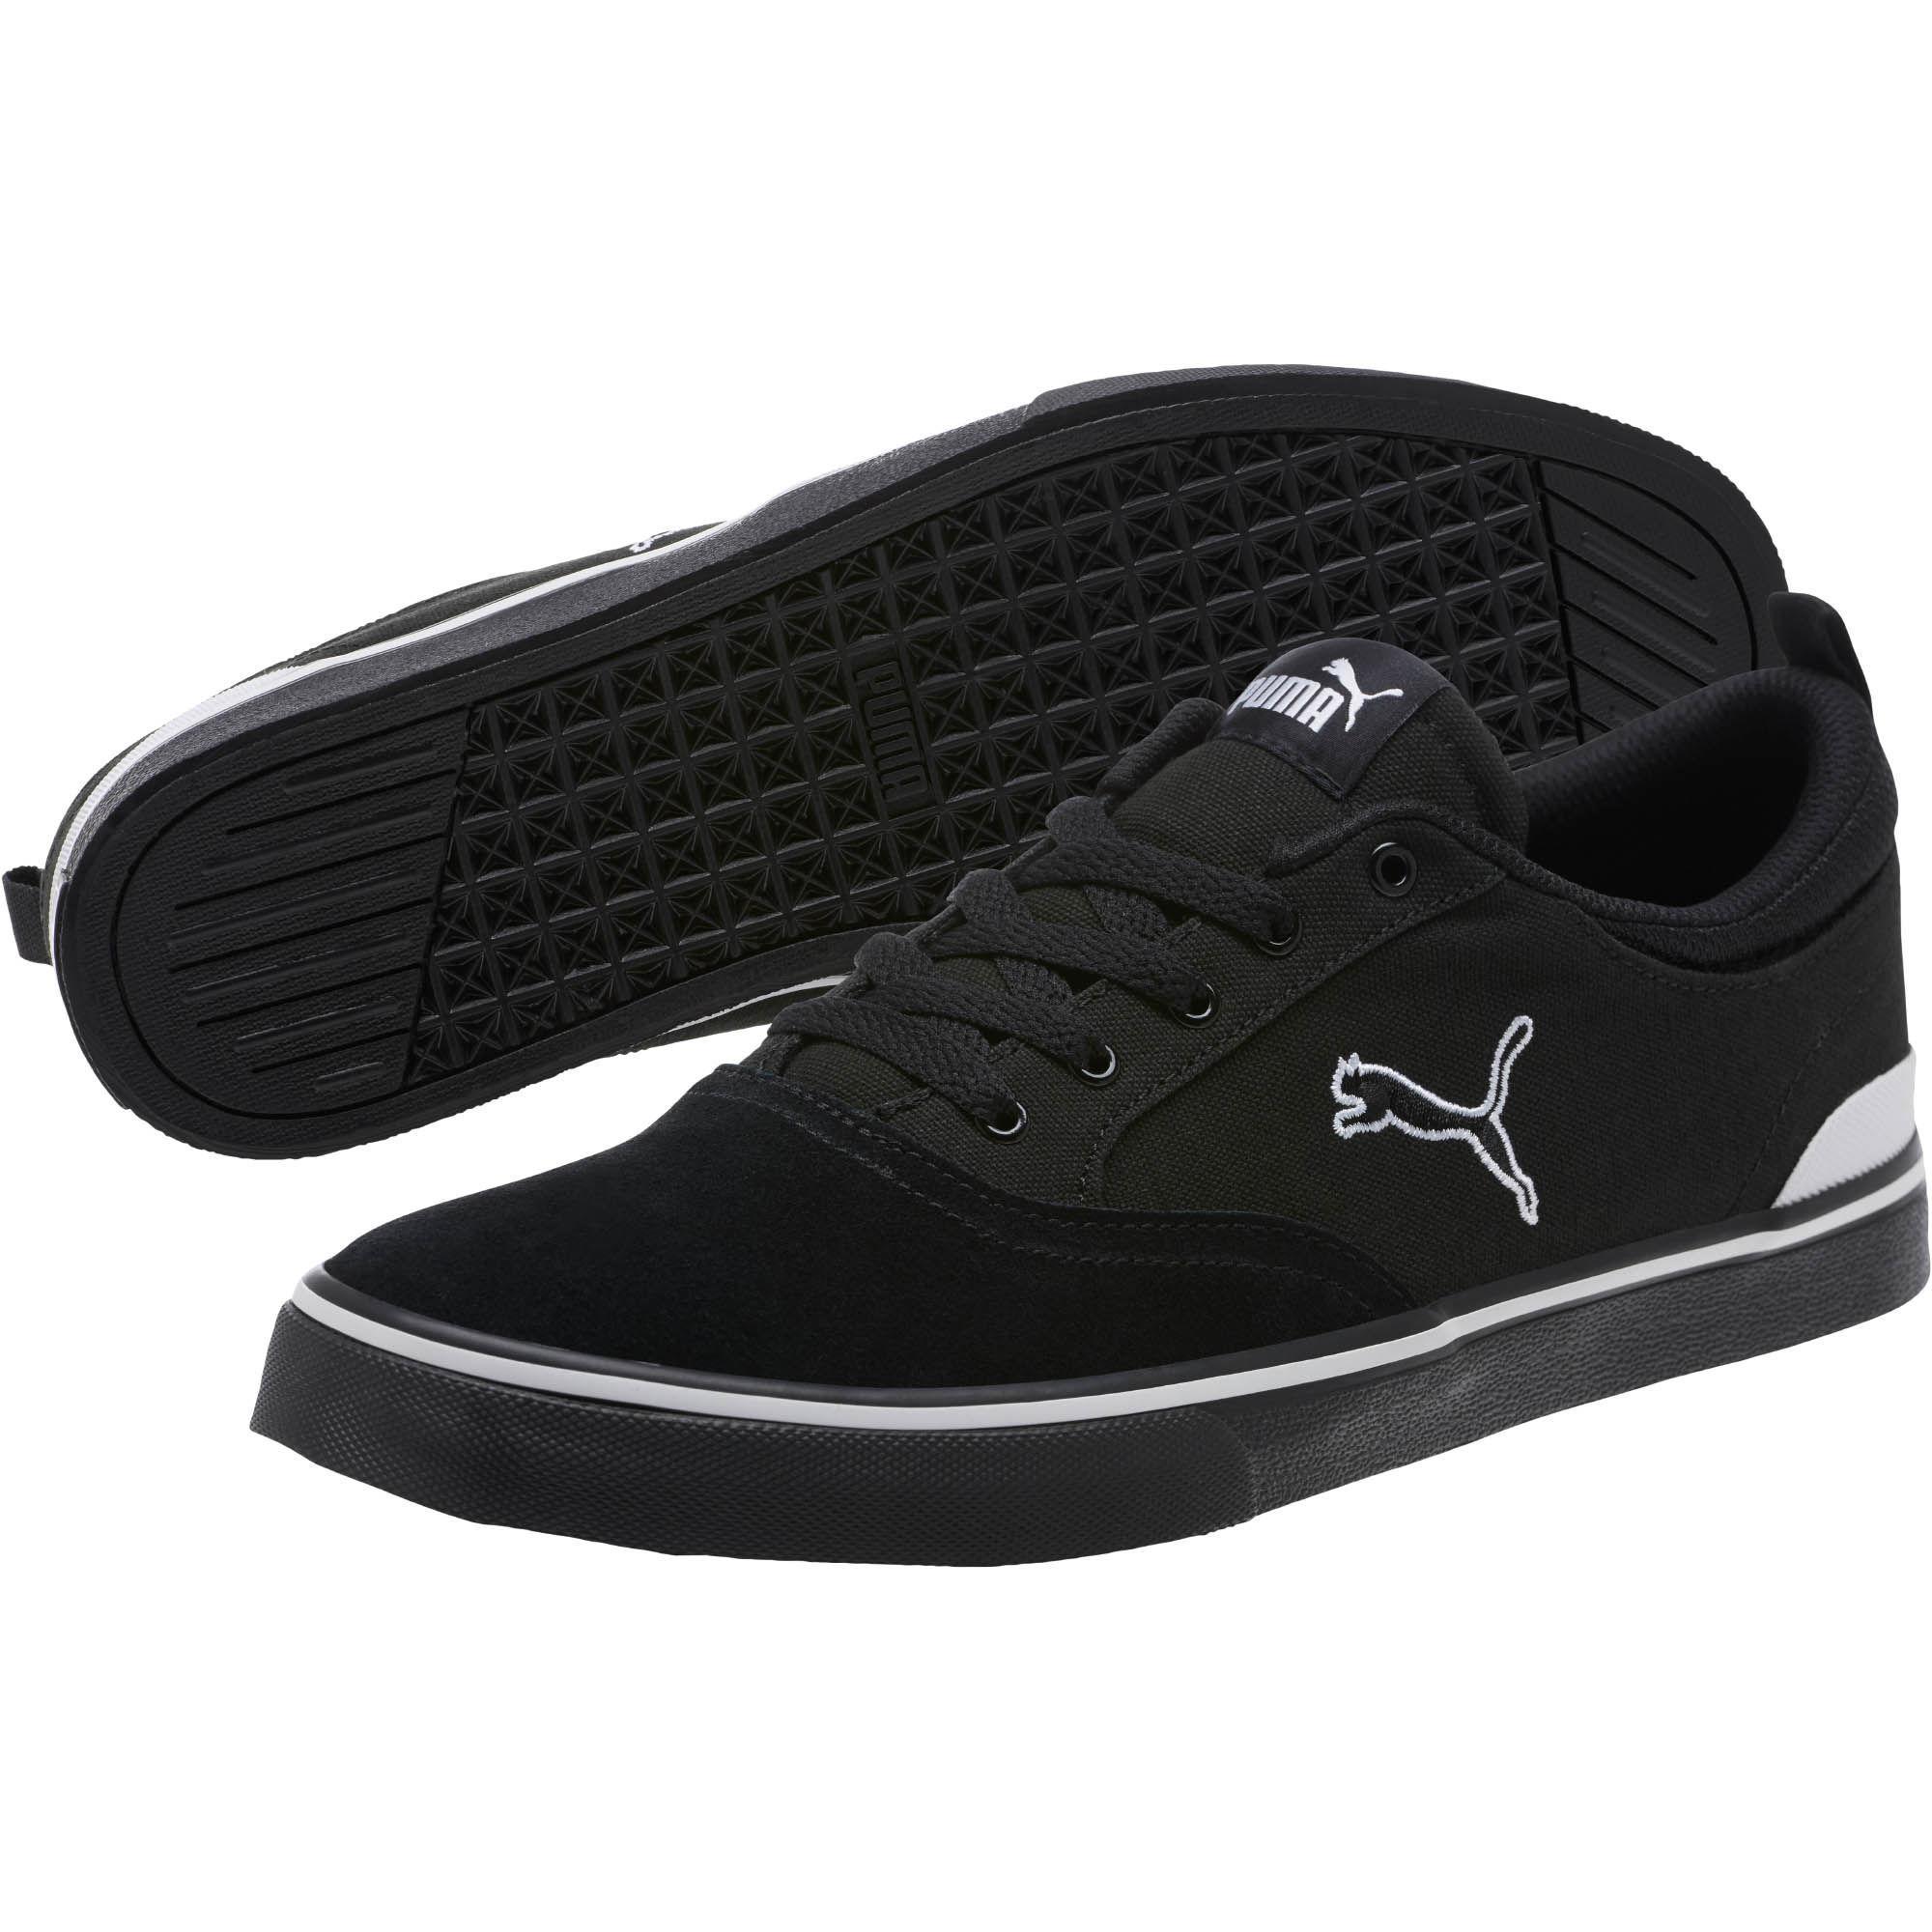 bf4e4e0b4584 Lyst - PUMA Bridger Cat Men s Sneakers in Black for Men